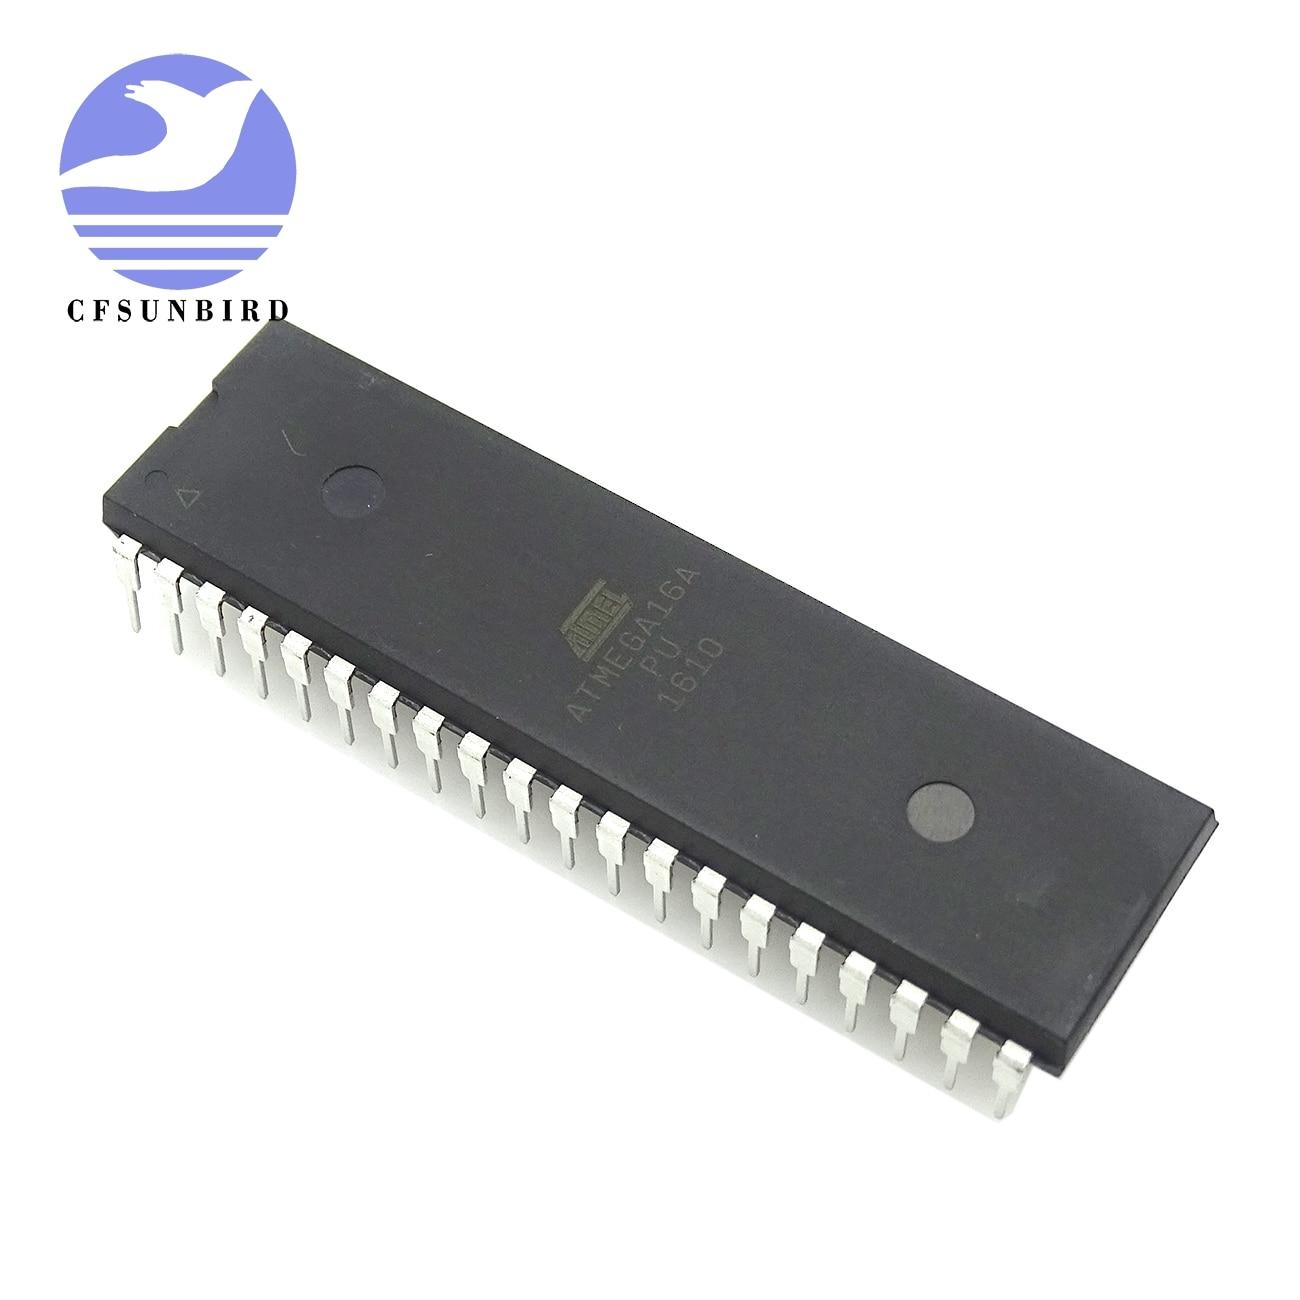 CFsunbird 1 шт./лот ATMEGA16A-PU ATMEGA16 ATMEGA16A DIP-40